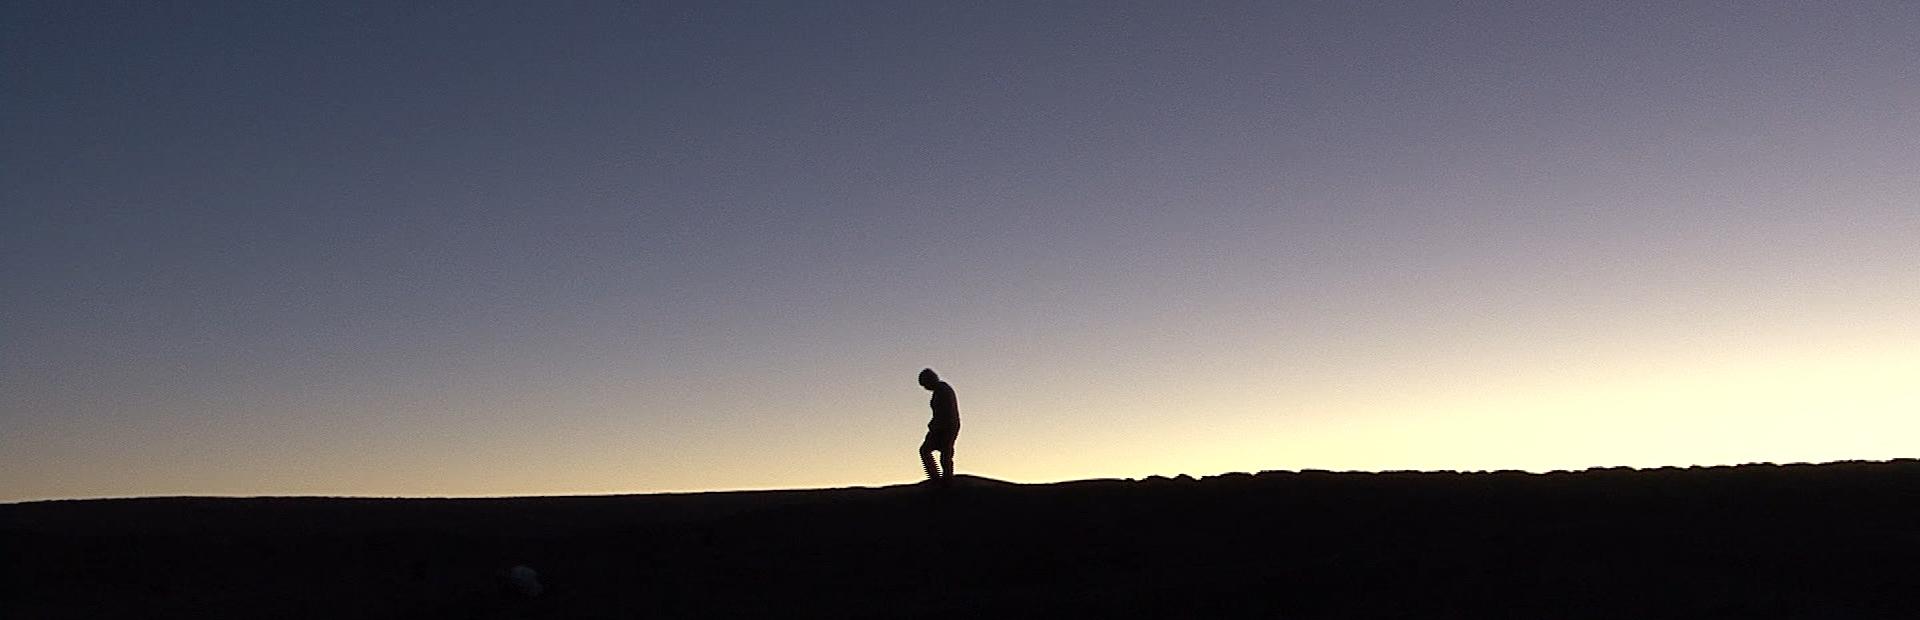 Nostalgia de la luz. Patricio Guzmán (2010) Francia-Chile-Alemania. 90 min